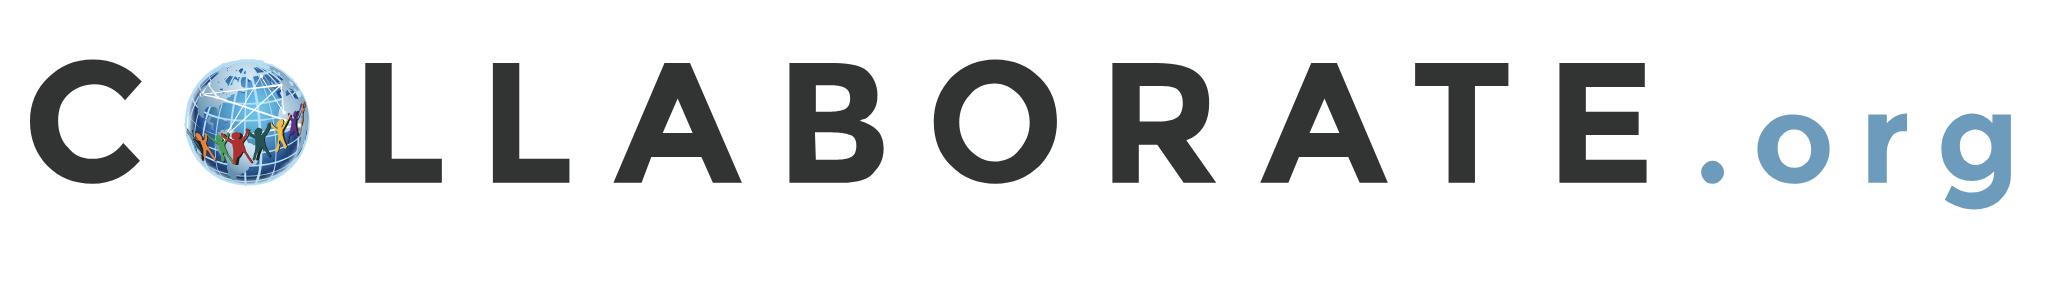 Collaborate.org